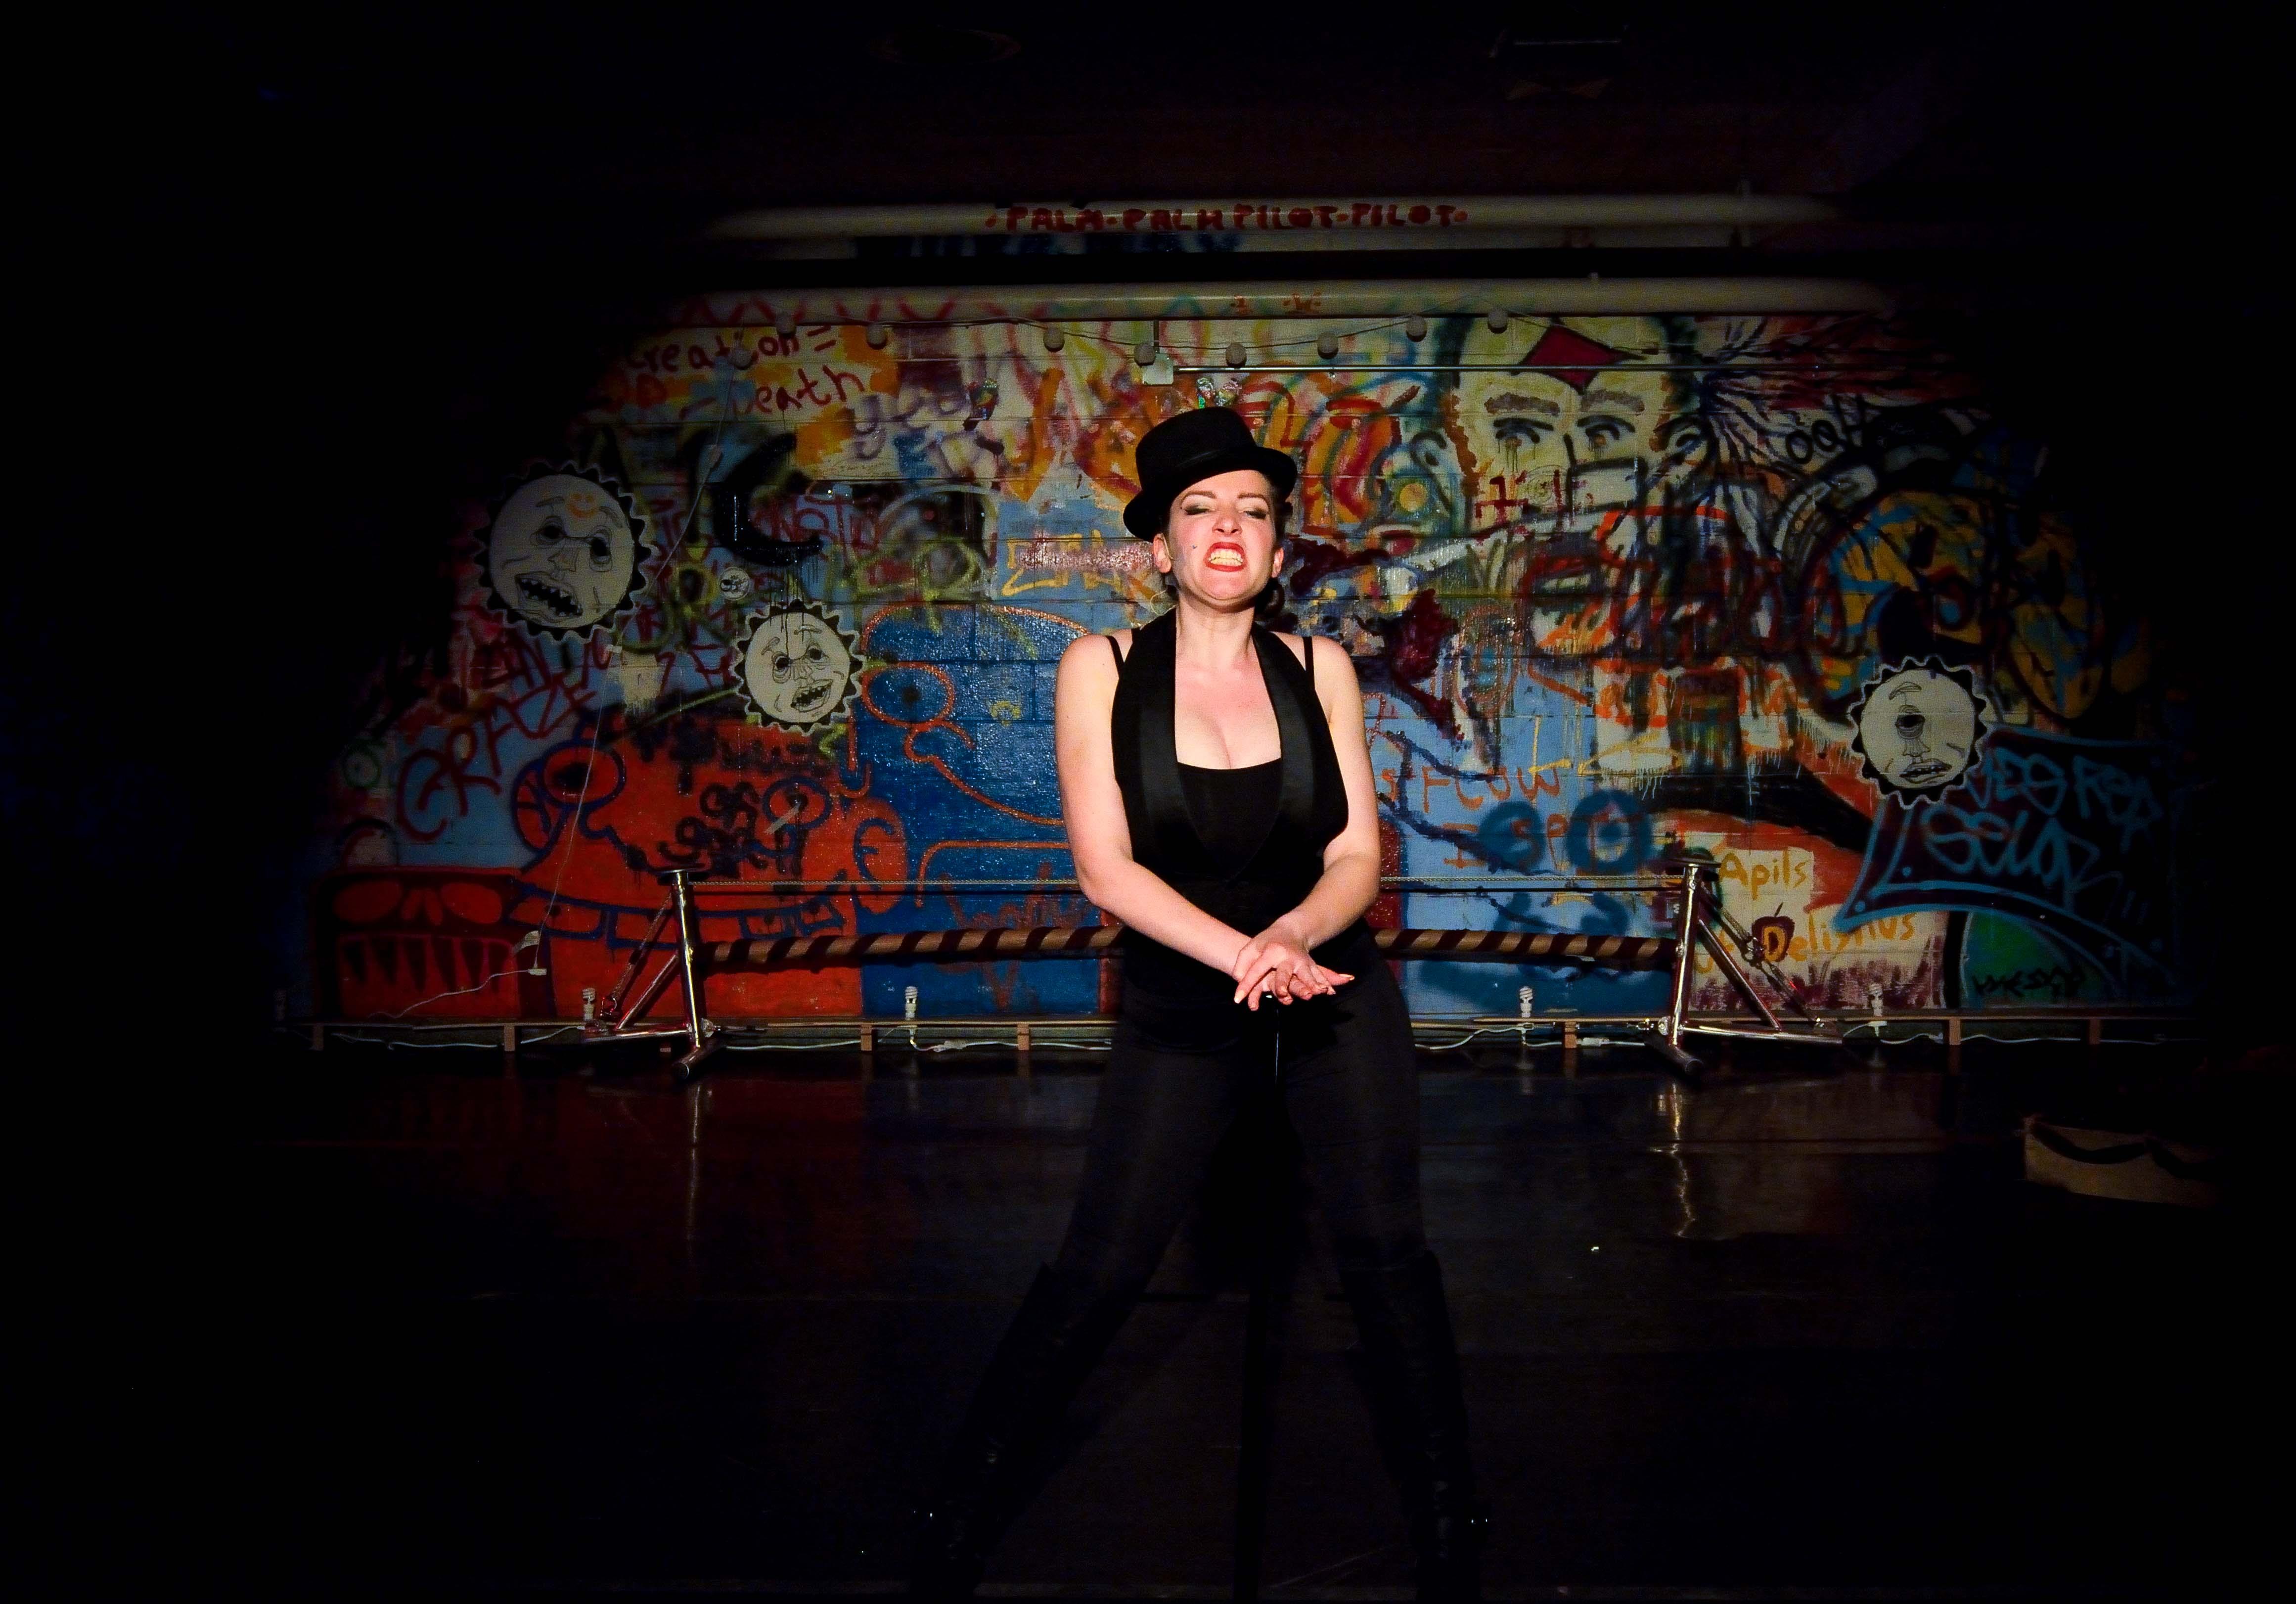 Sonya Sternlieb, Staff Photographer